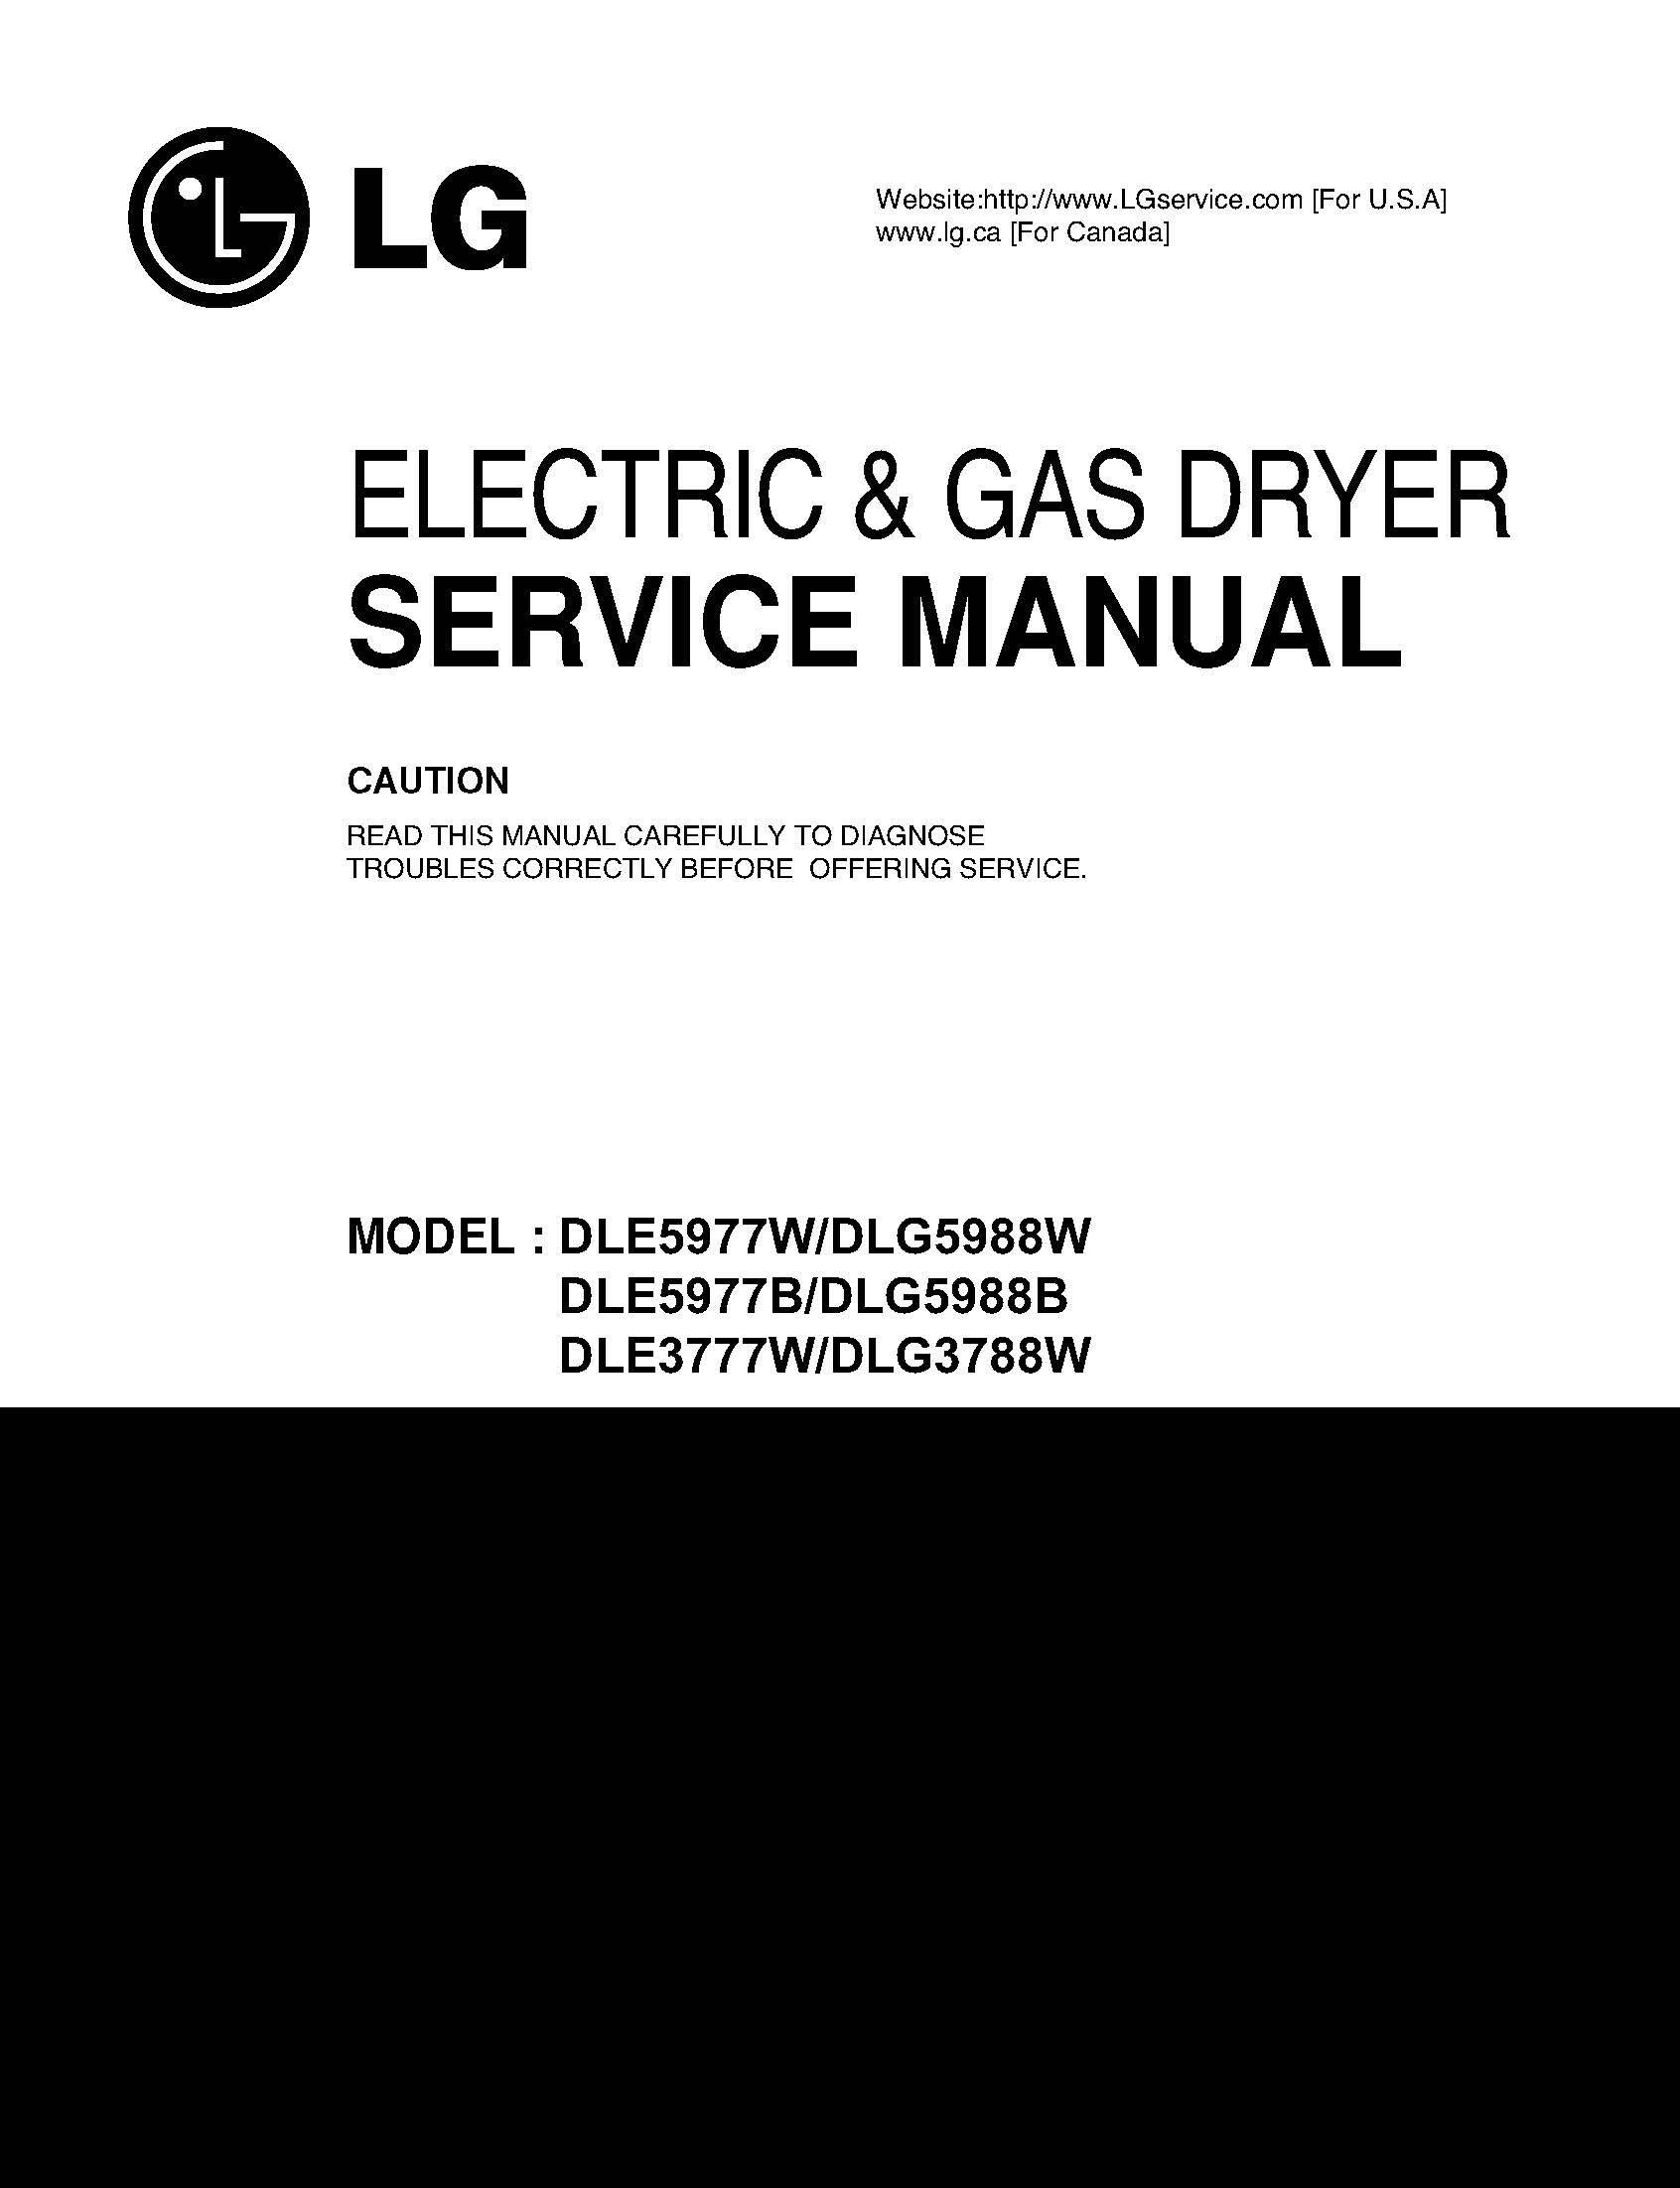 Lg d5988b service manual pdf download.